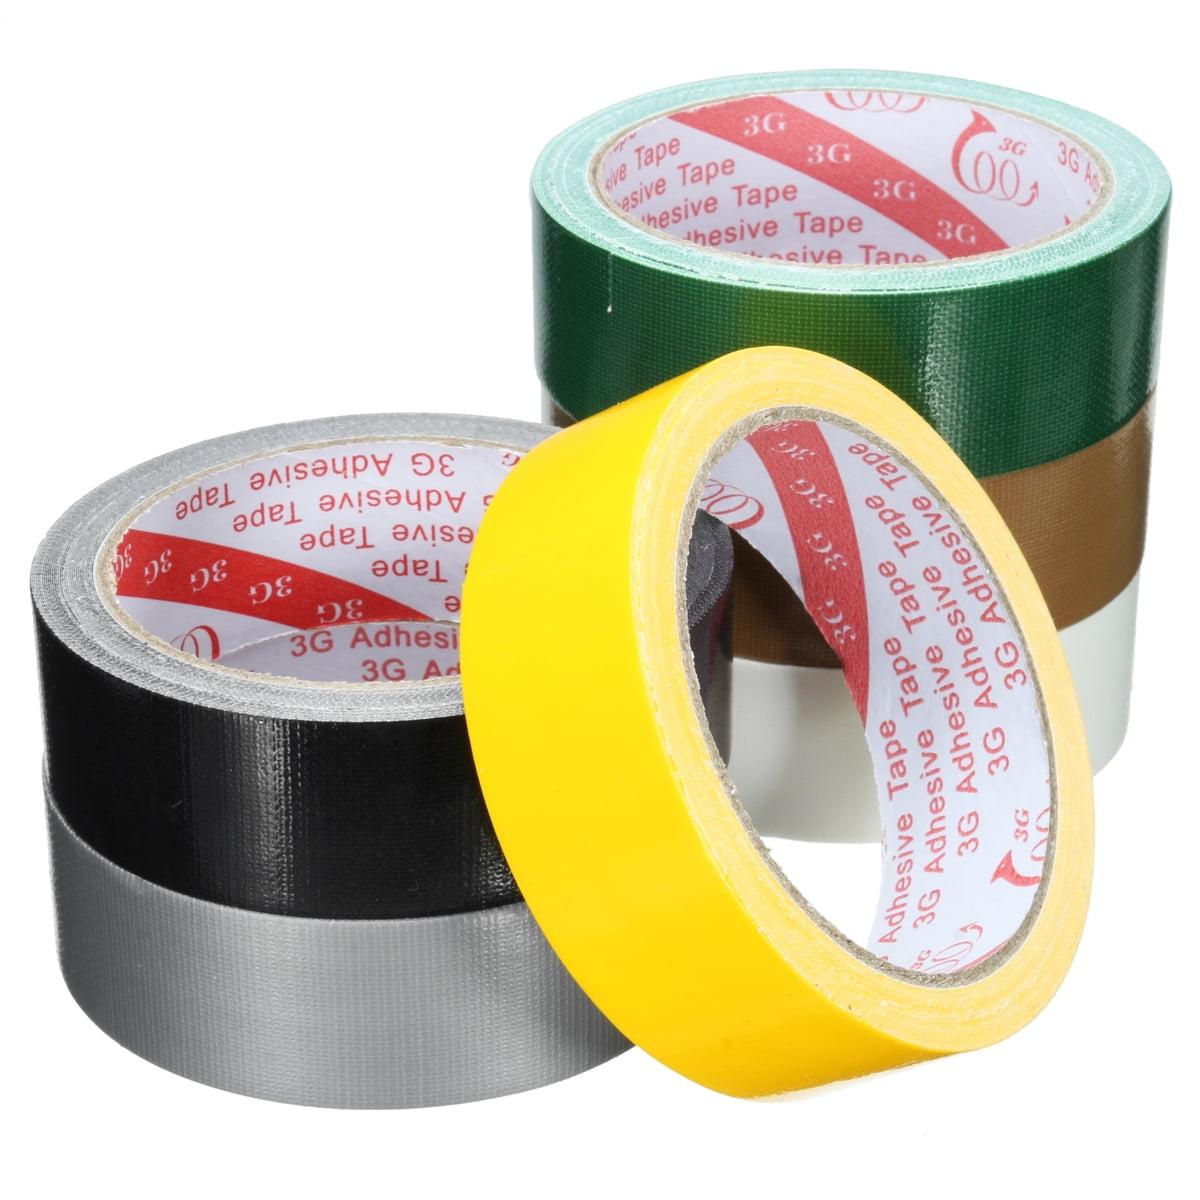 "1.18""x393"" glueamptape Waterproof Self Adhesive Repair Cloth Tape Performance Repair Tape Self Adhesive Tape Packaging Tape Duct Pipe Wrap Carpet"